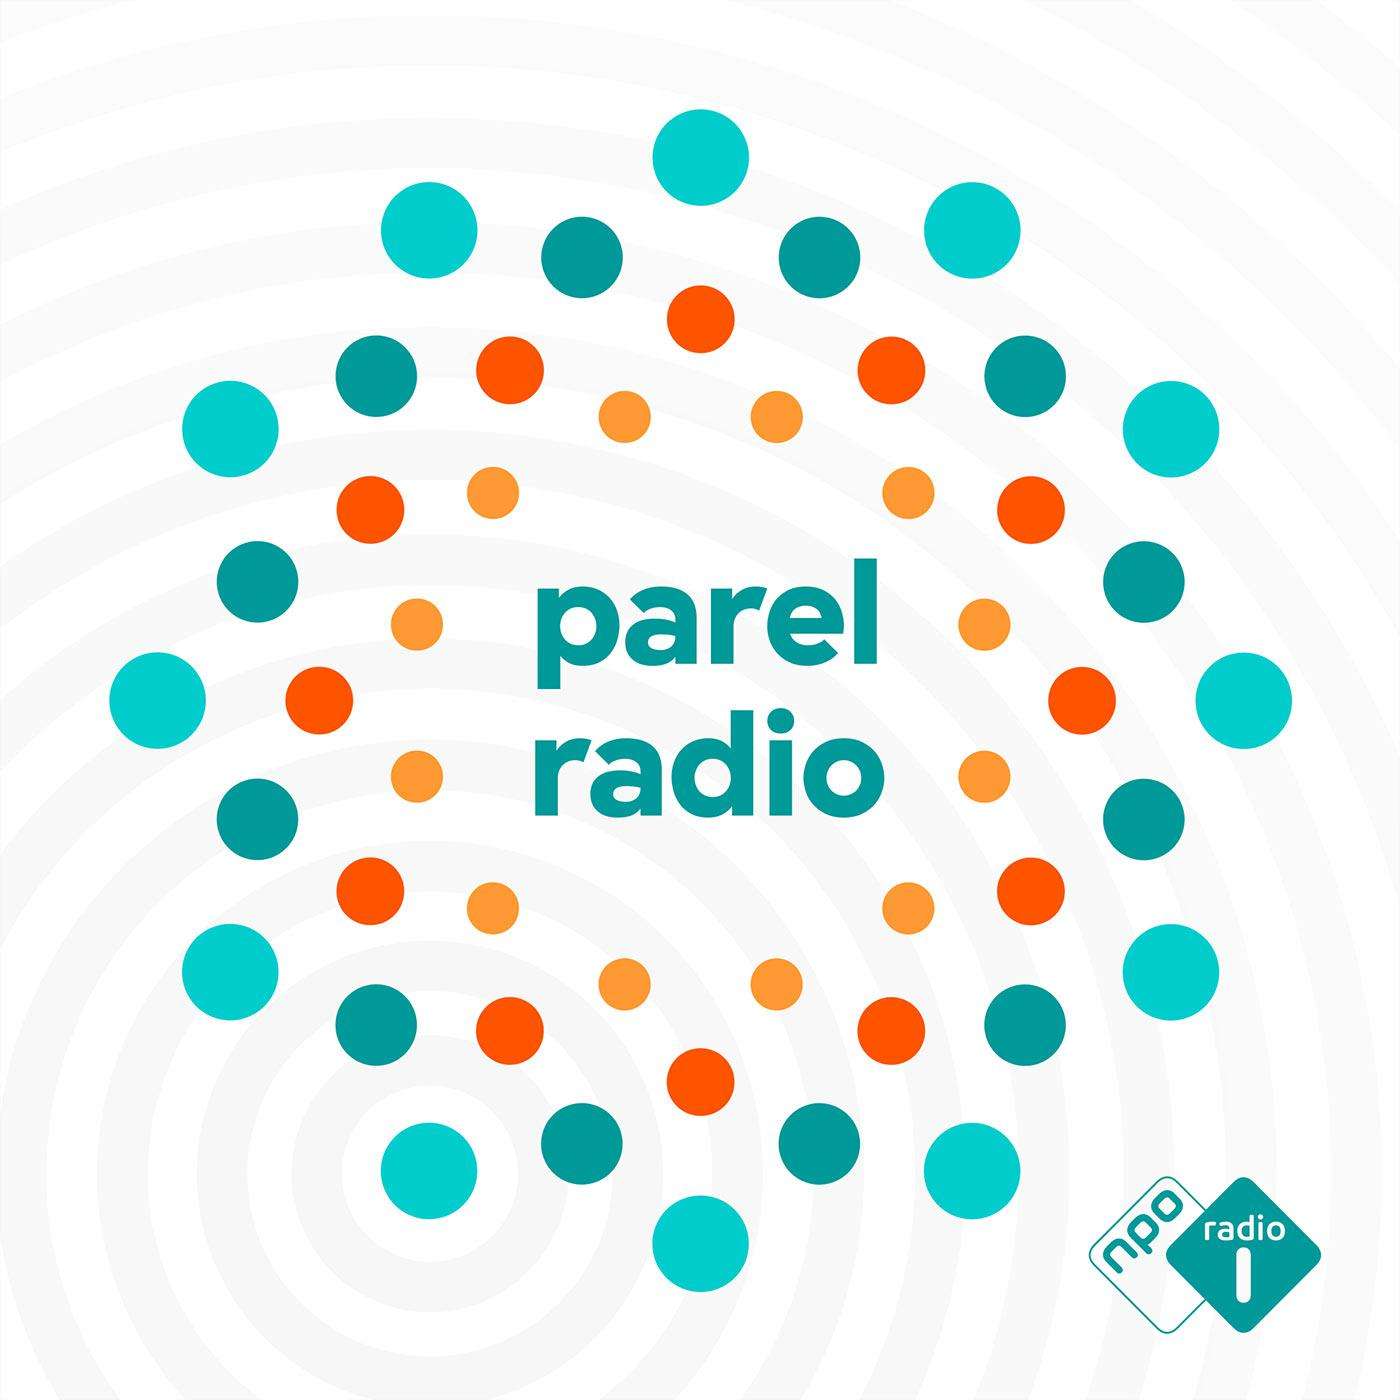 14. Parel Radio - Parel Radio, NPO Radio 1